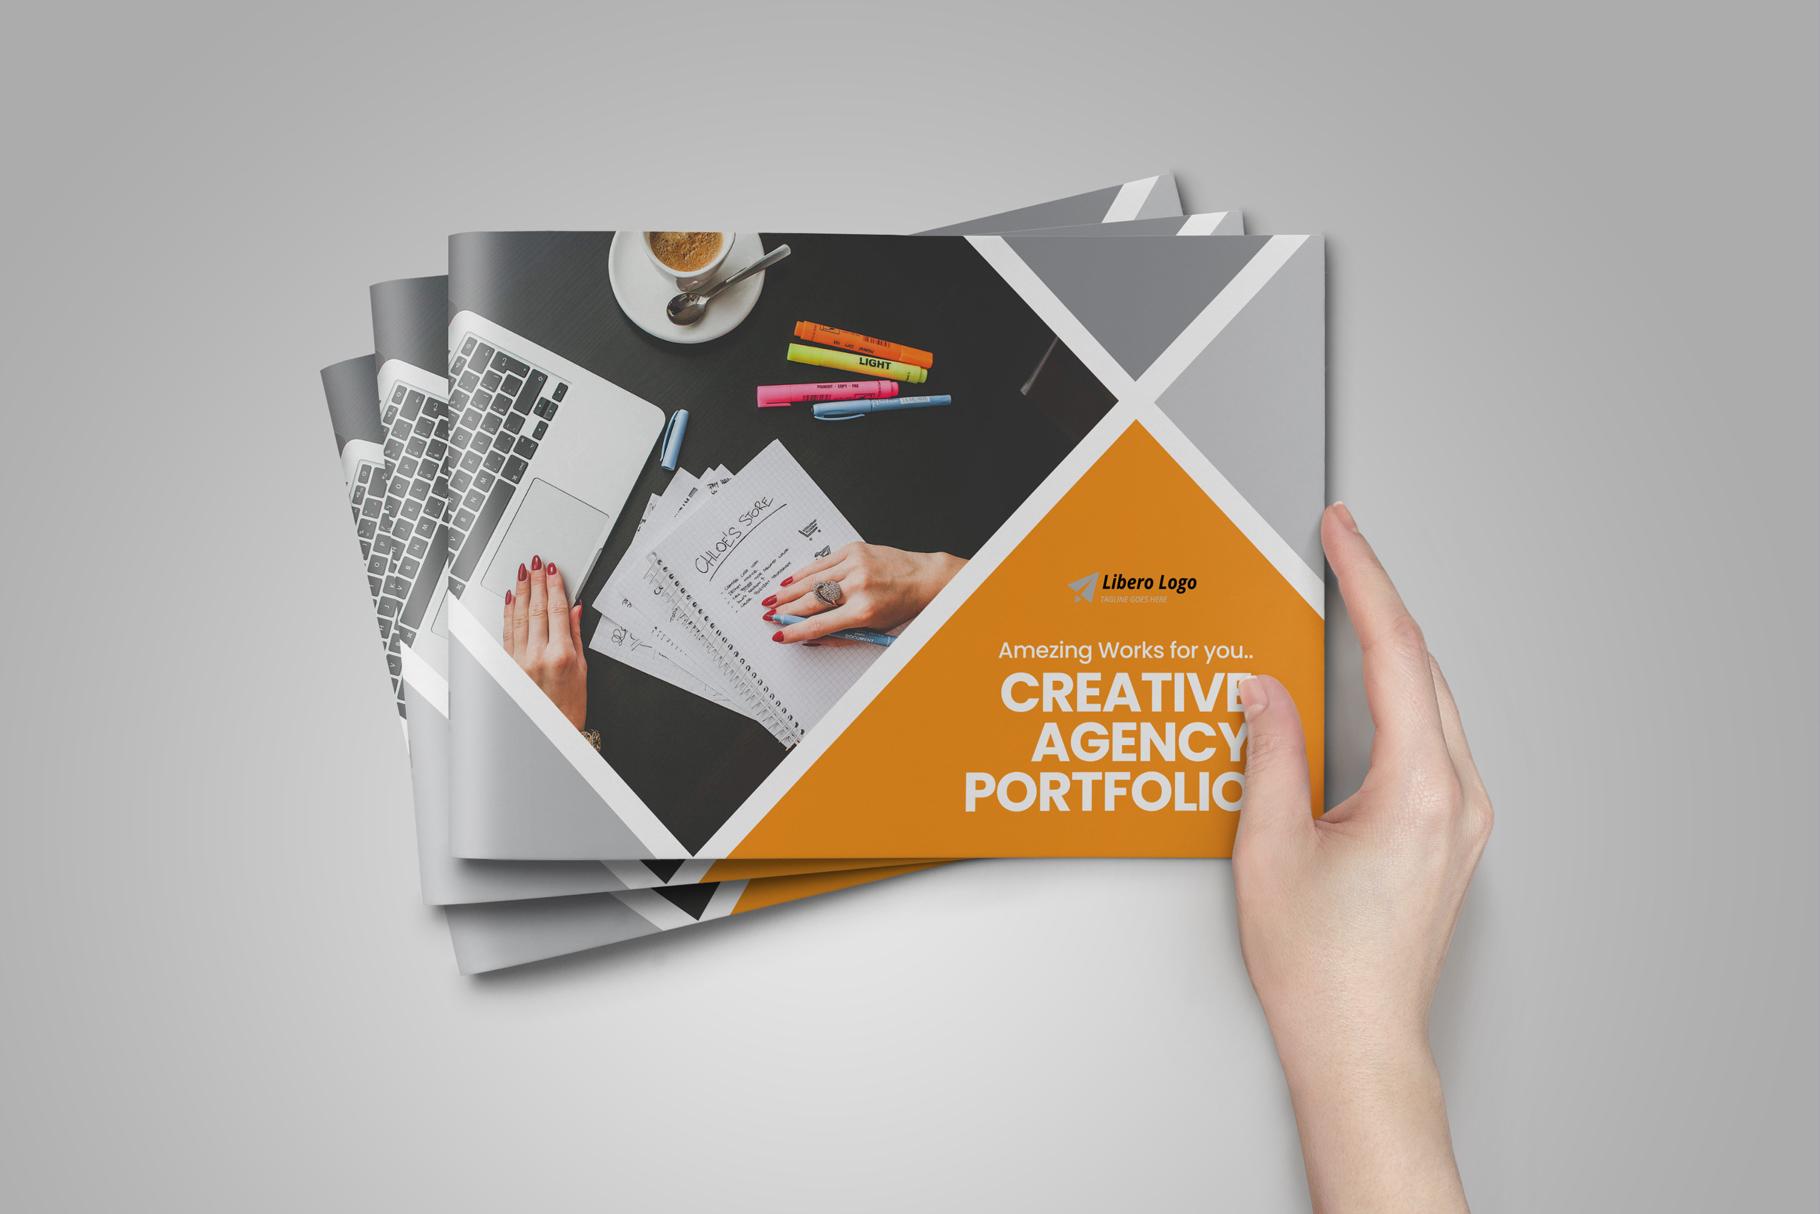 Digital Agency Portfolio Brochure v2 example image 2